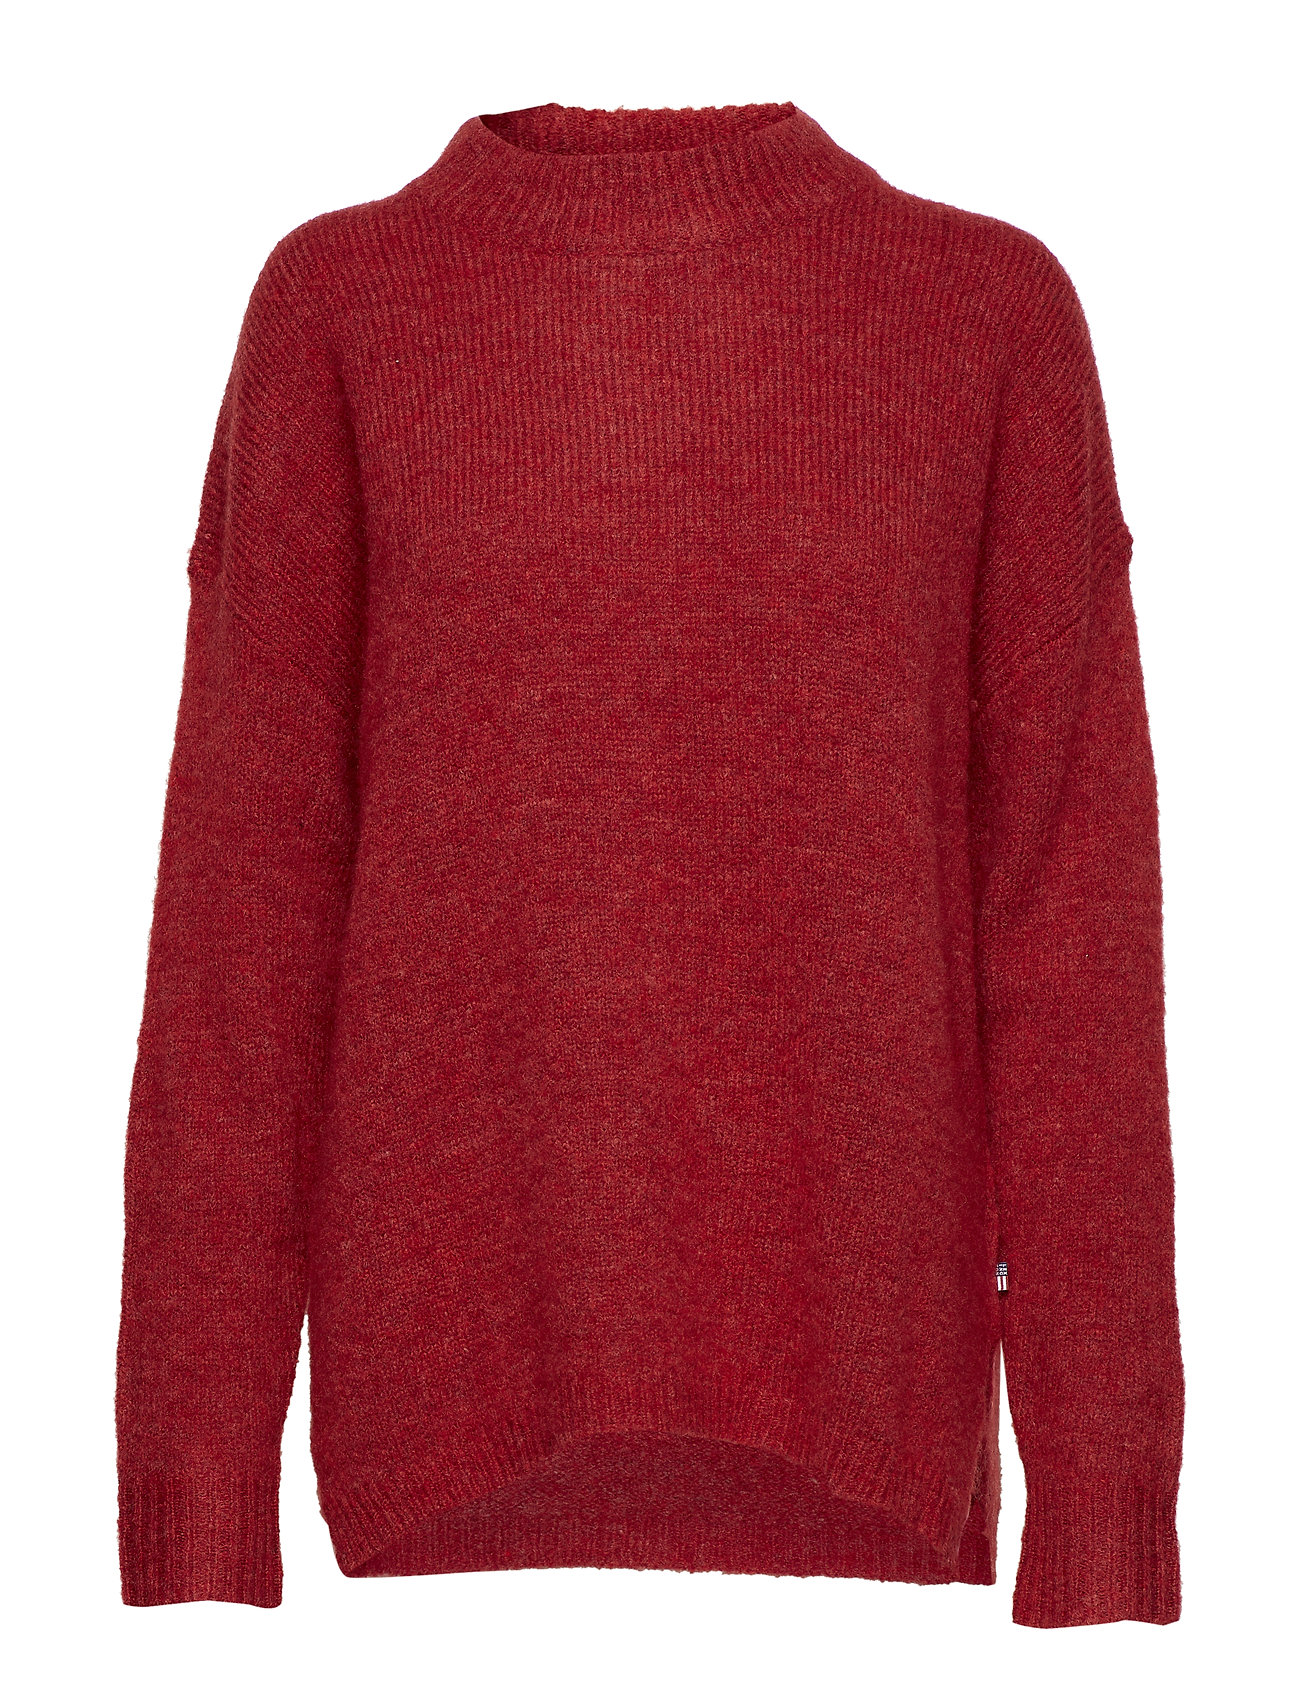 Lexington Clothing Talula Sweater